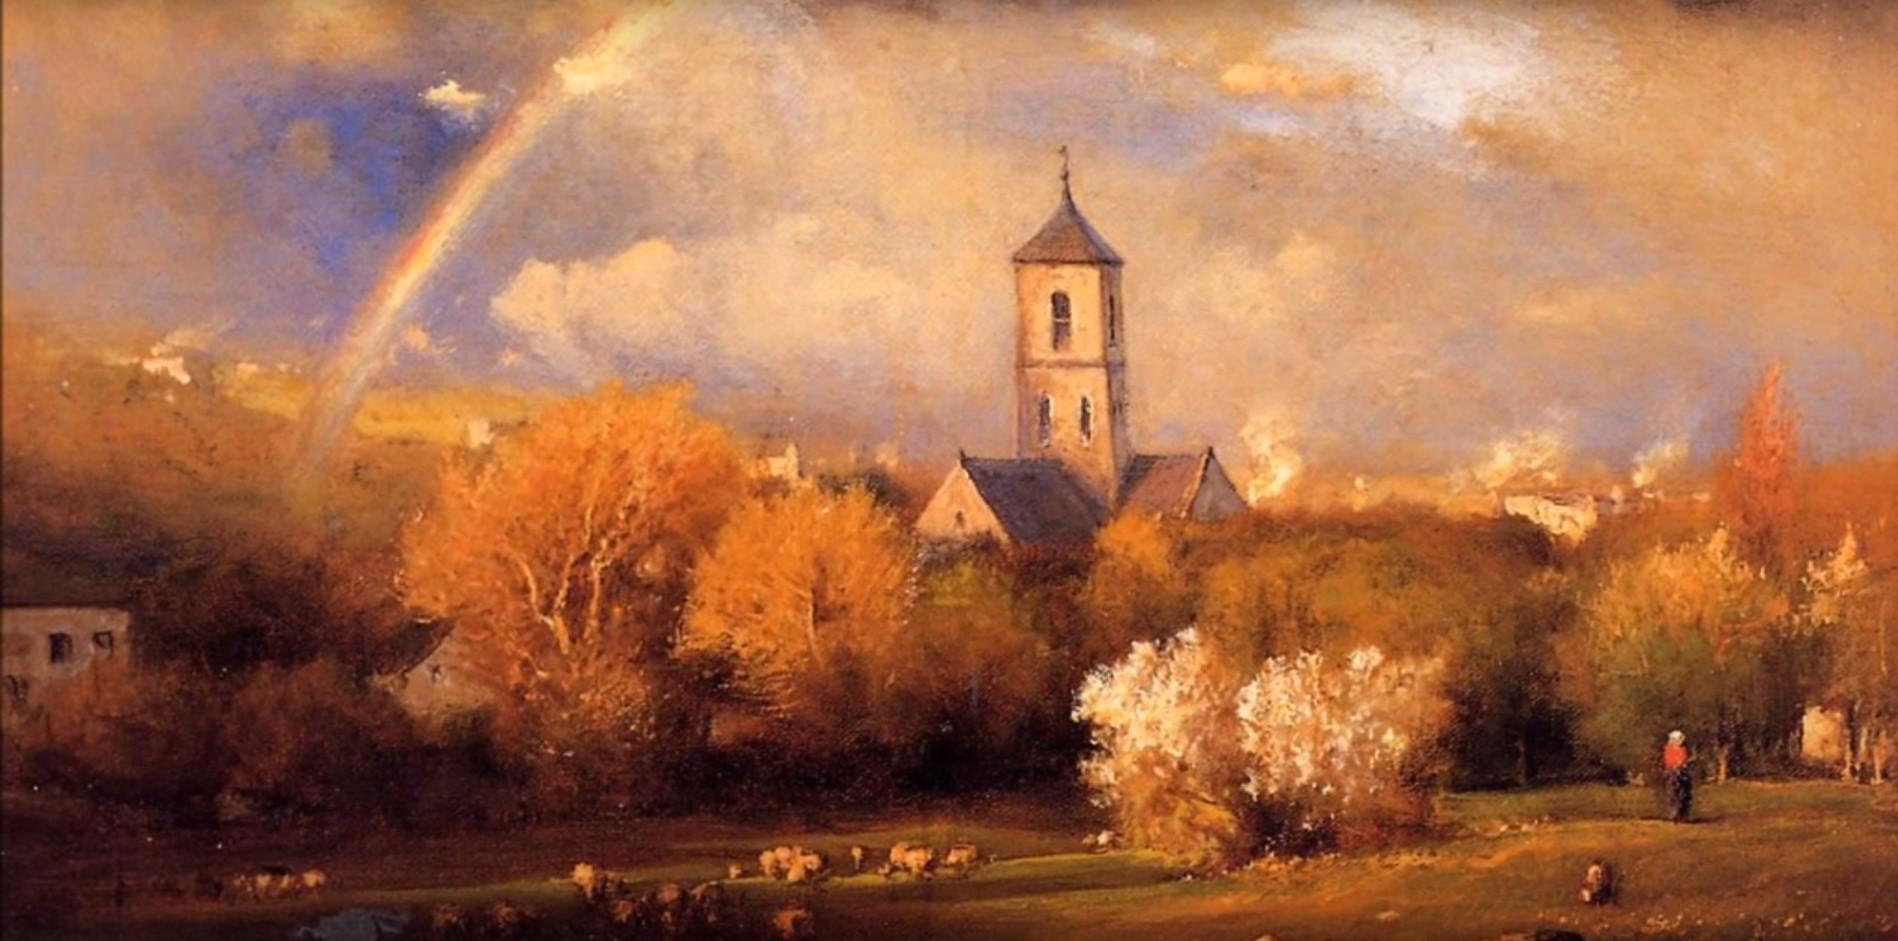 George Inness (1825 -1894)